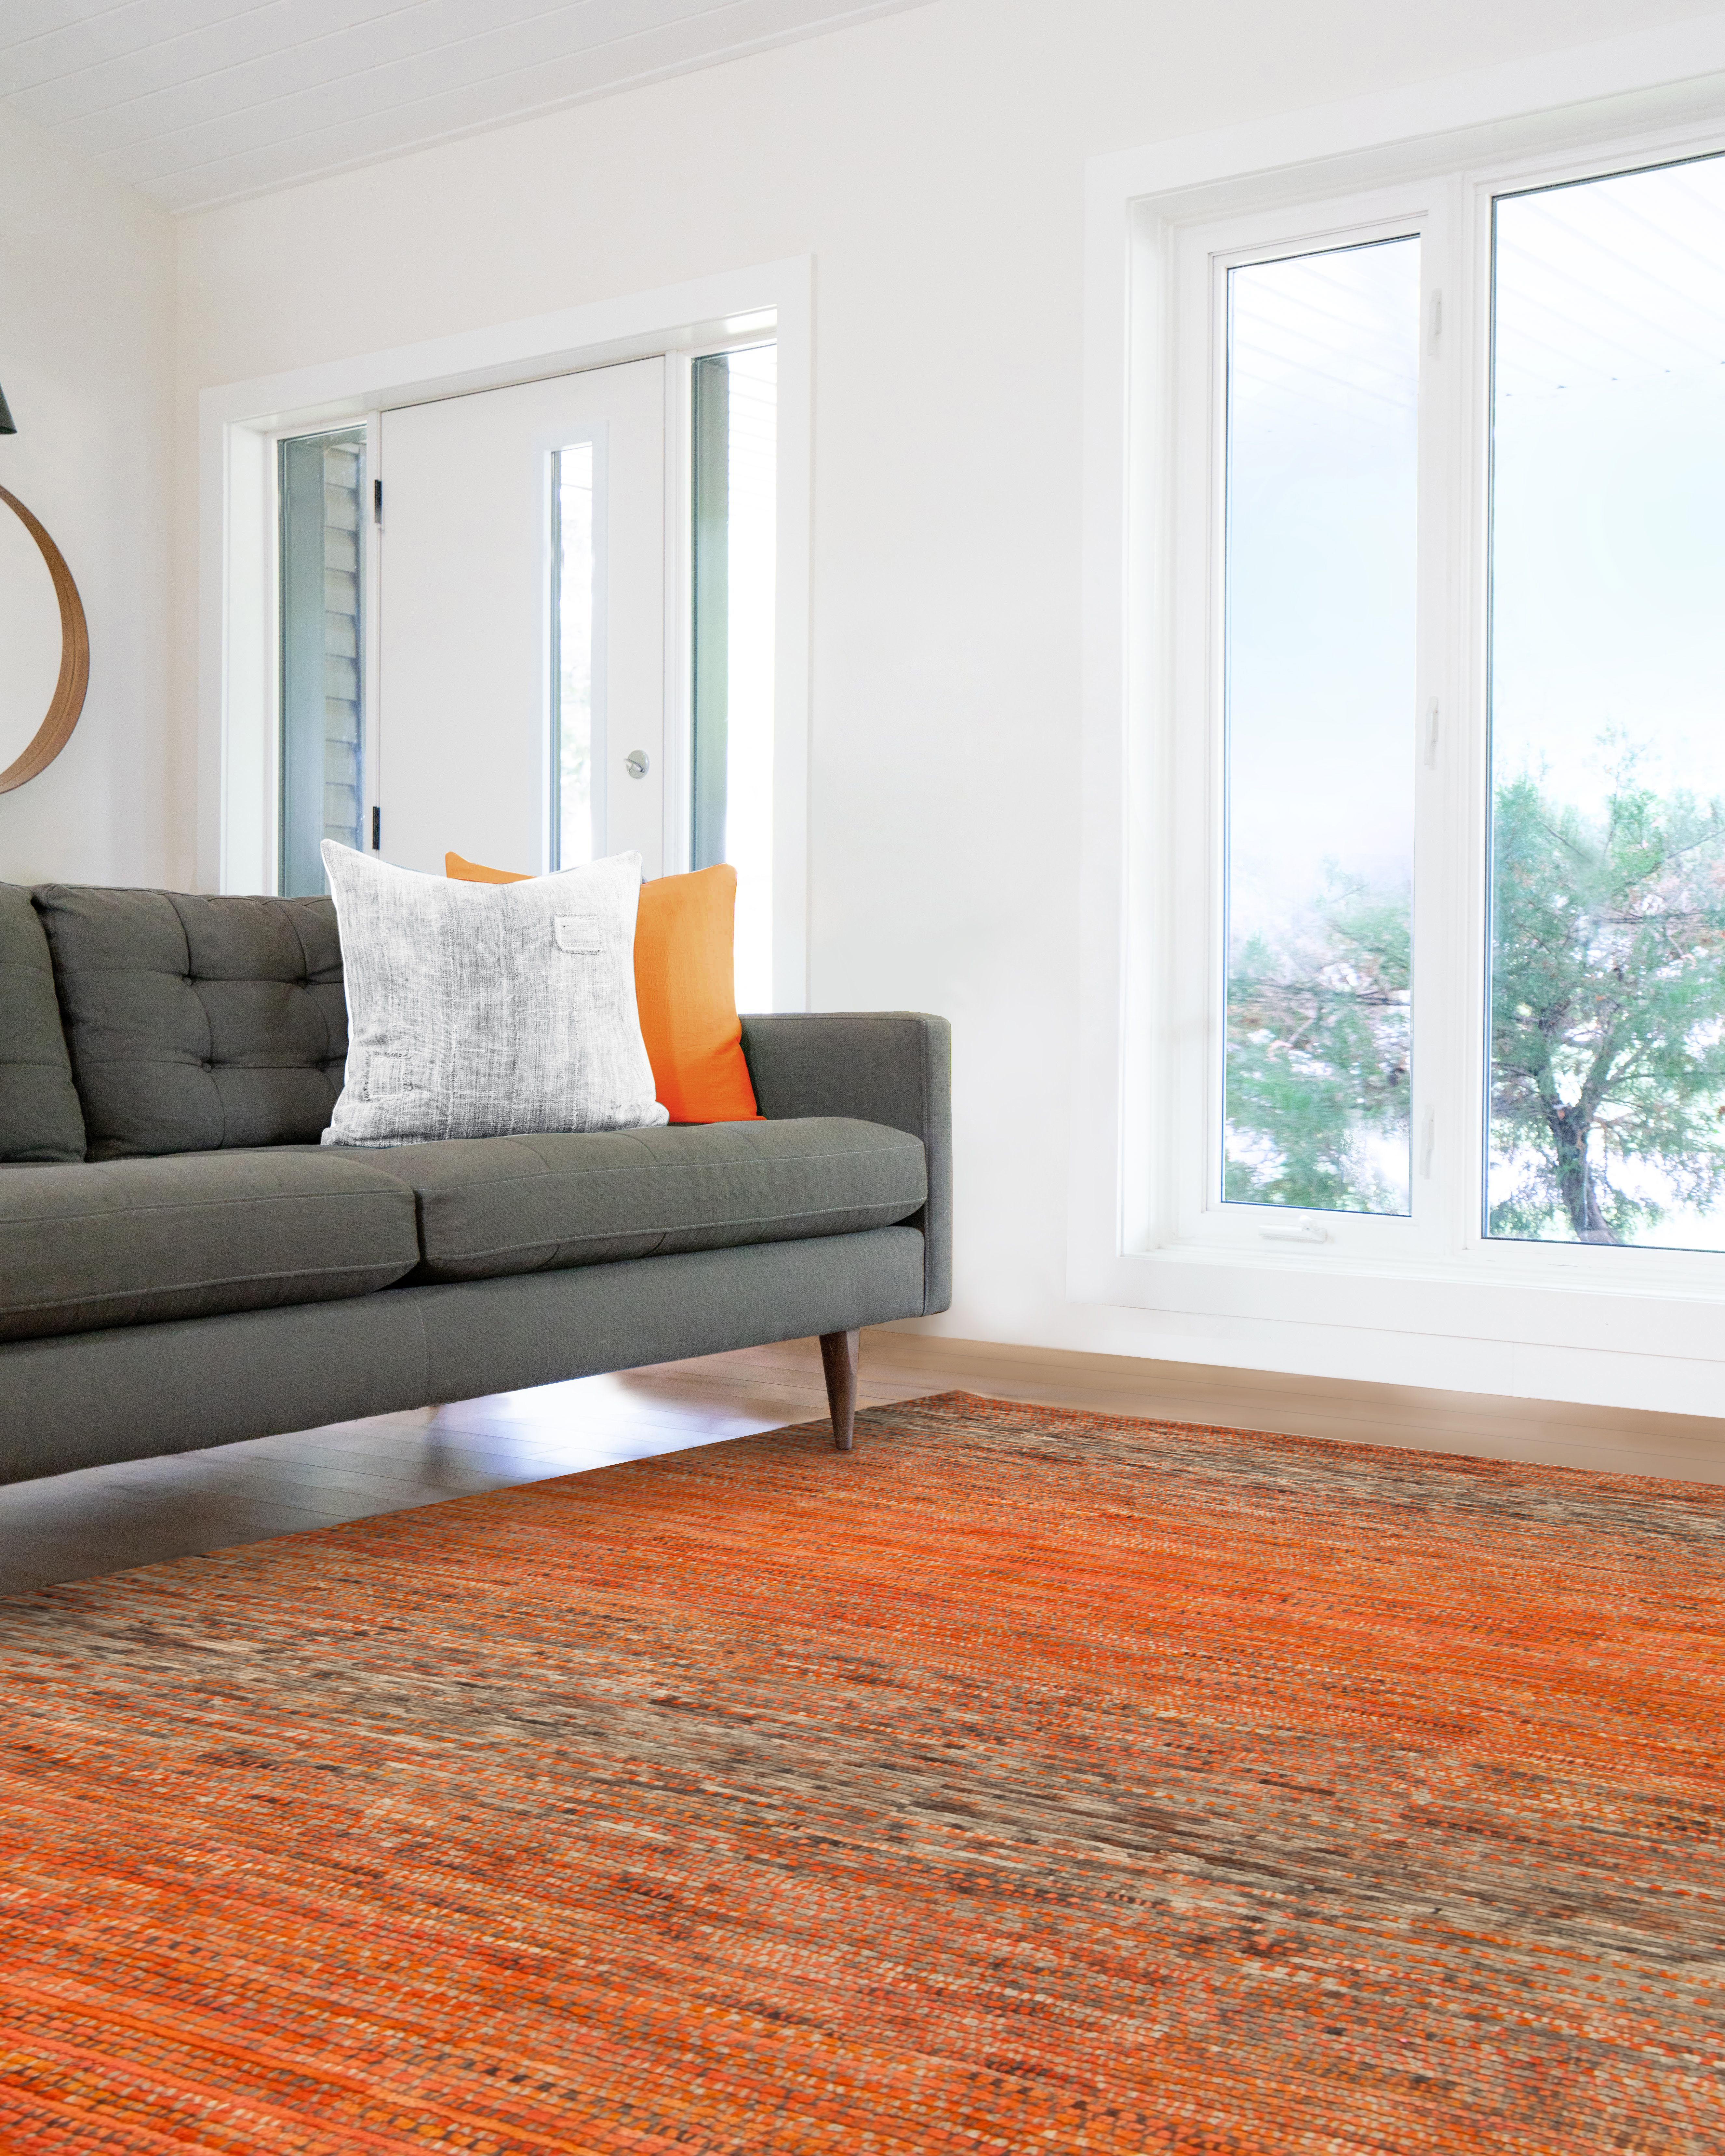 Orange Rug Livingroom Decor | Orange rugs, Living room decor